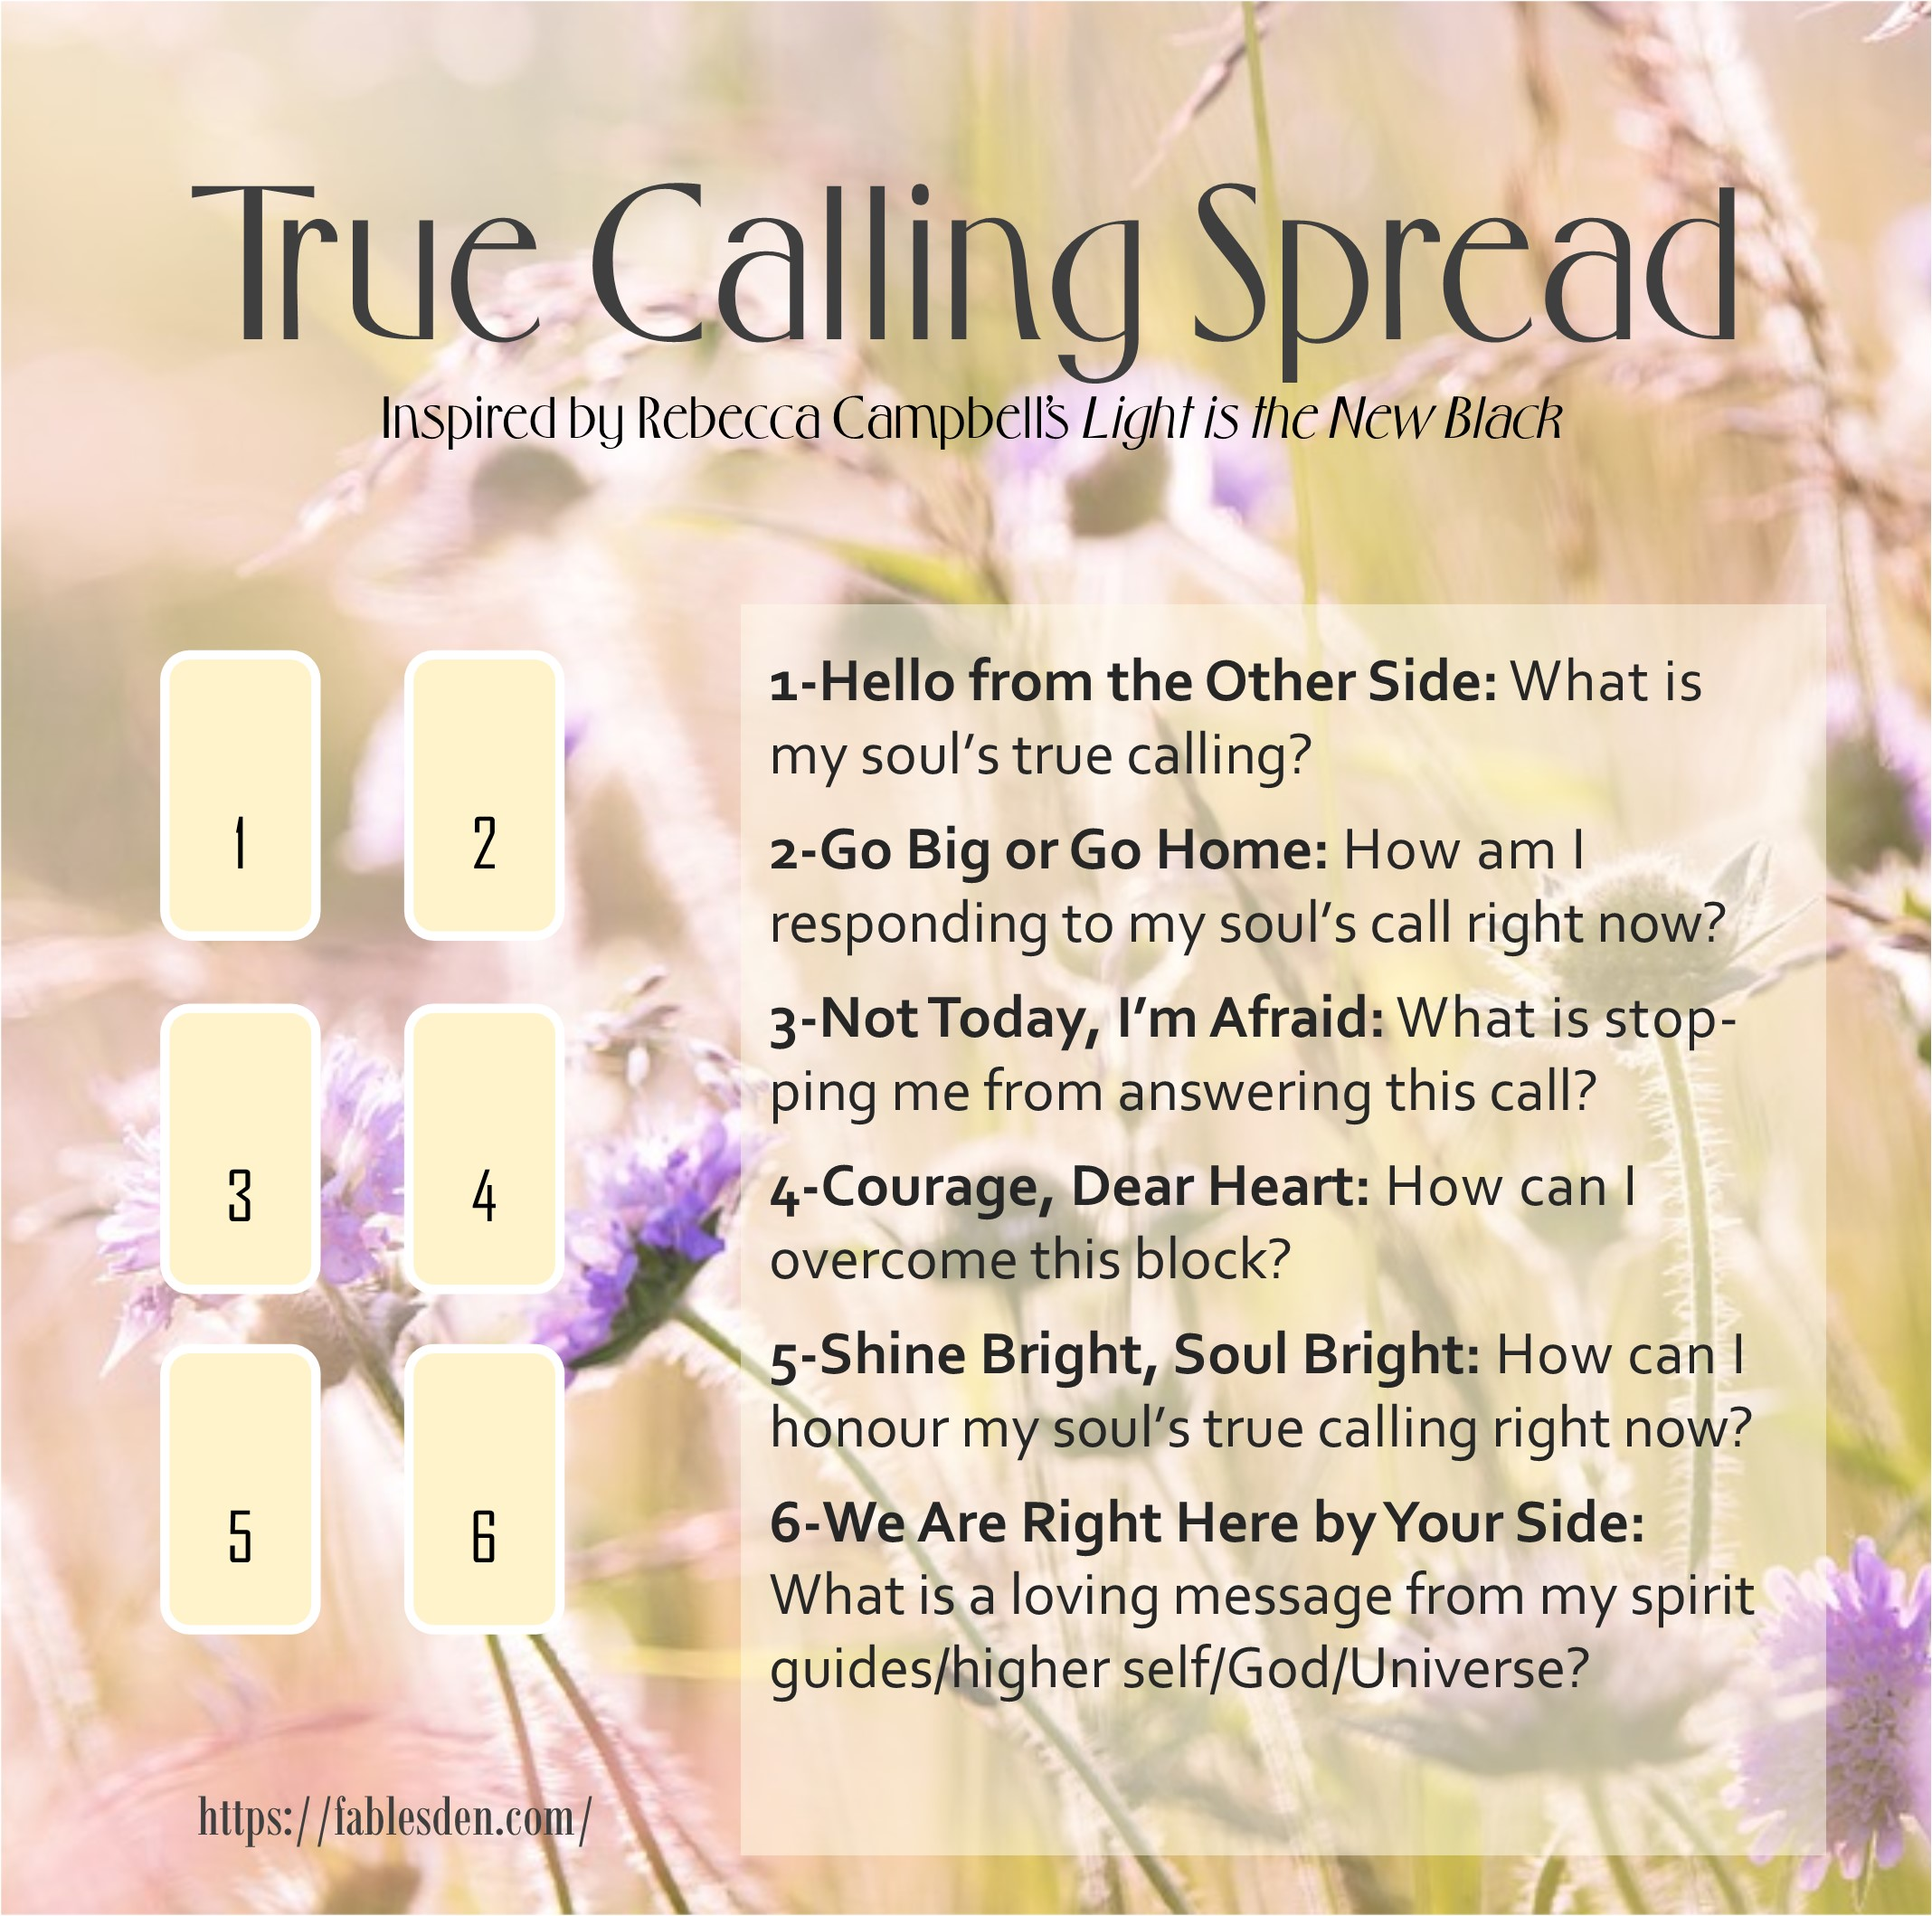 True Calling Spread.jpg